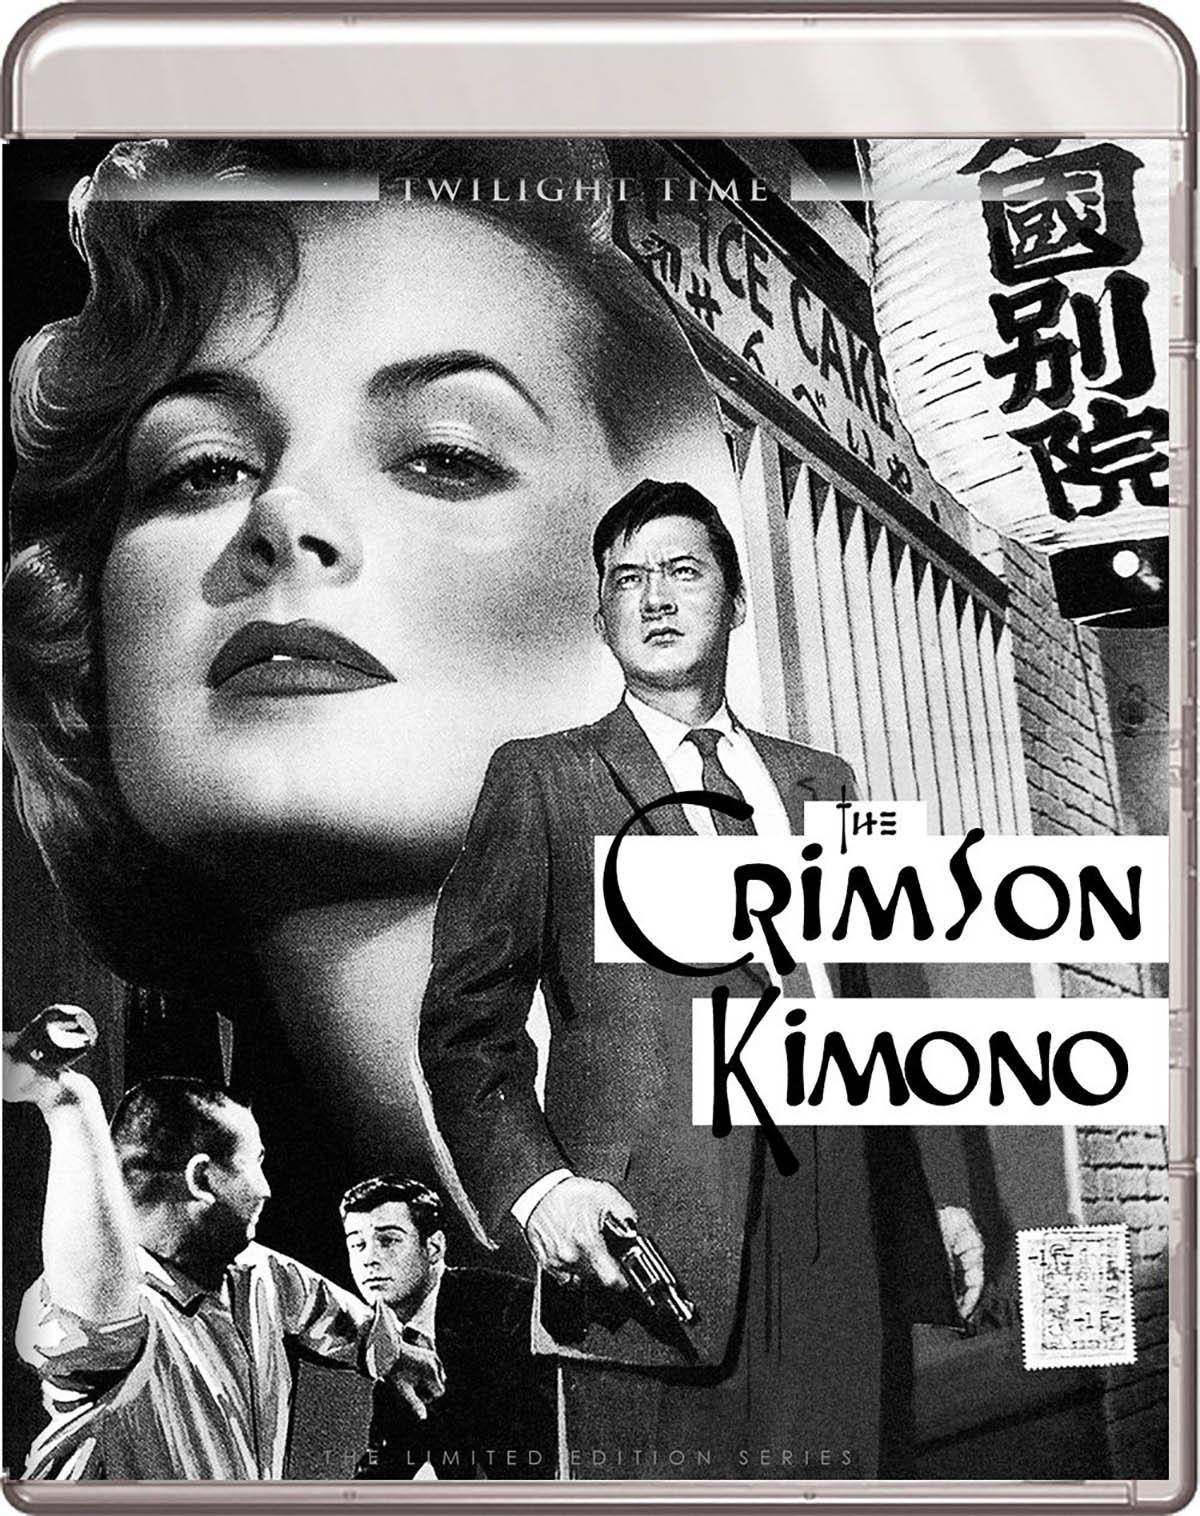 542da19abaa0 Blu-ray Review  The Crimson Kimono - Slant Magazine